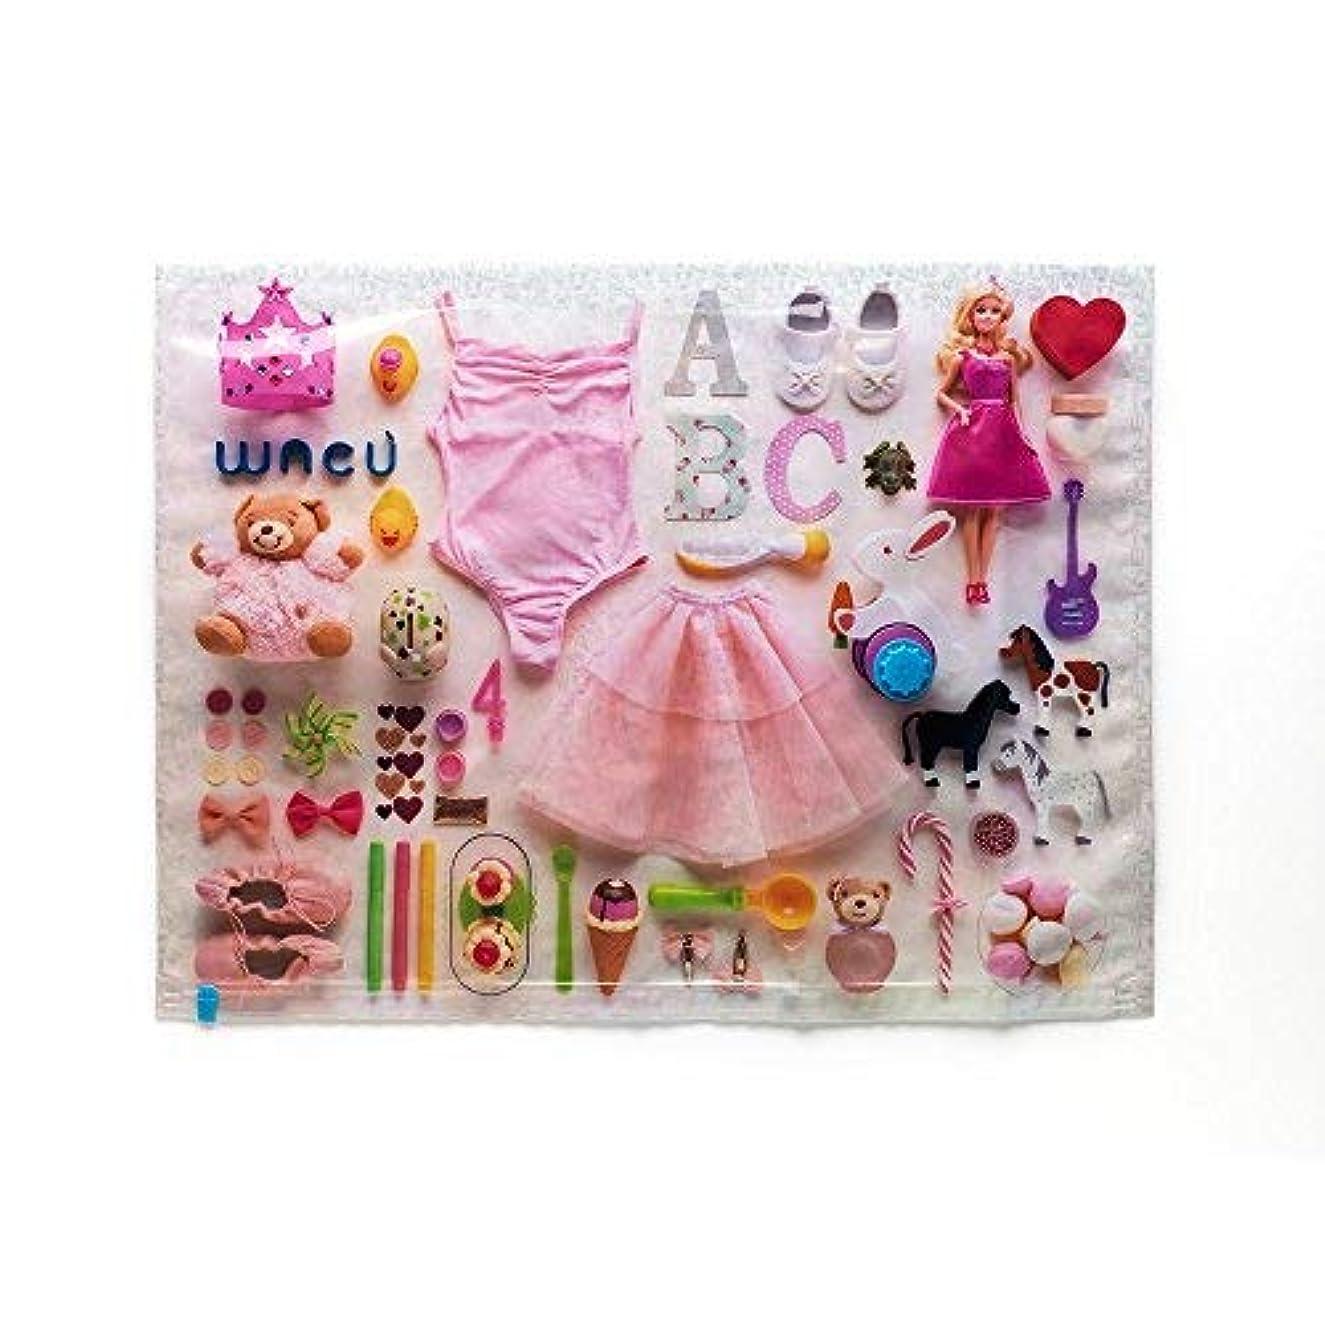 Wacù Space-Saving Vacuum Bag - The Little Princess - Size M